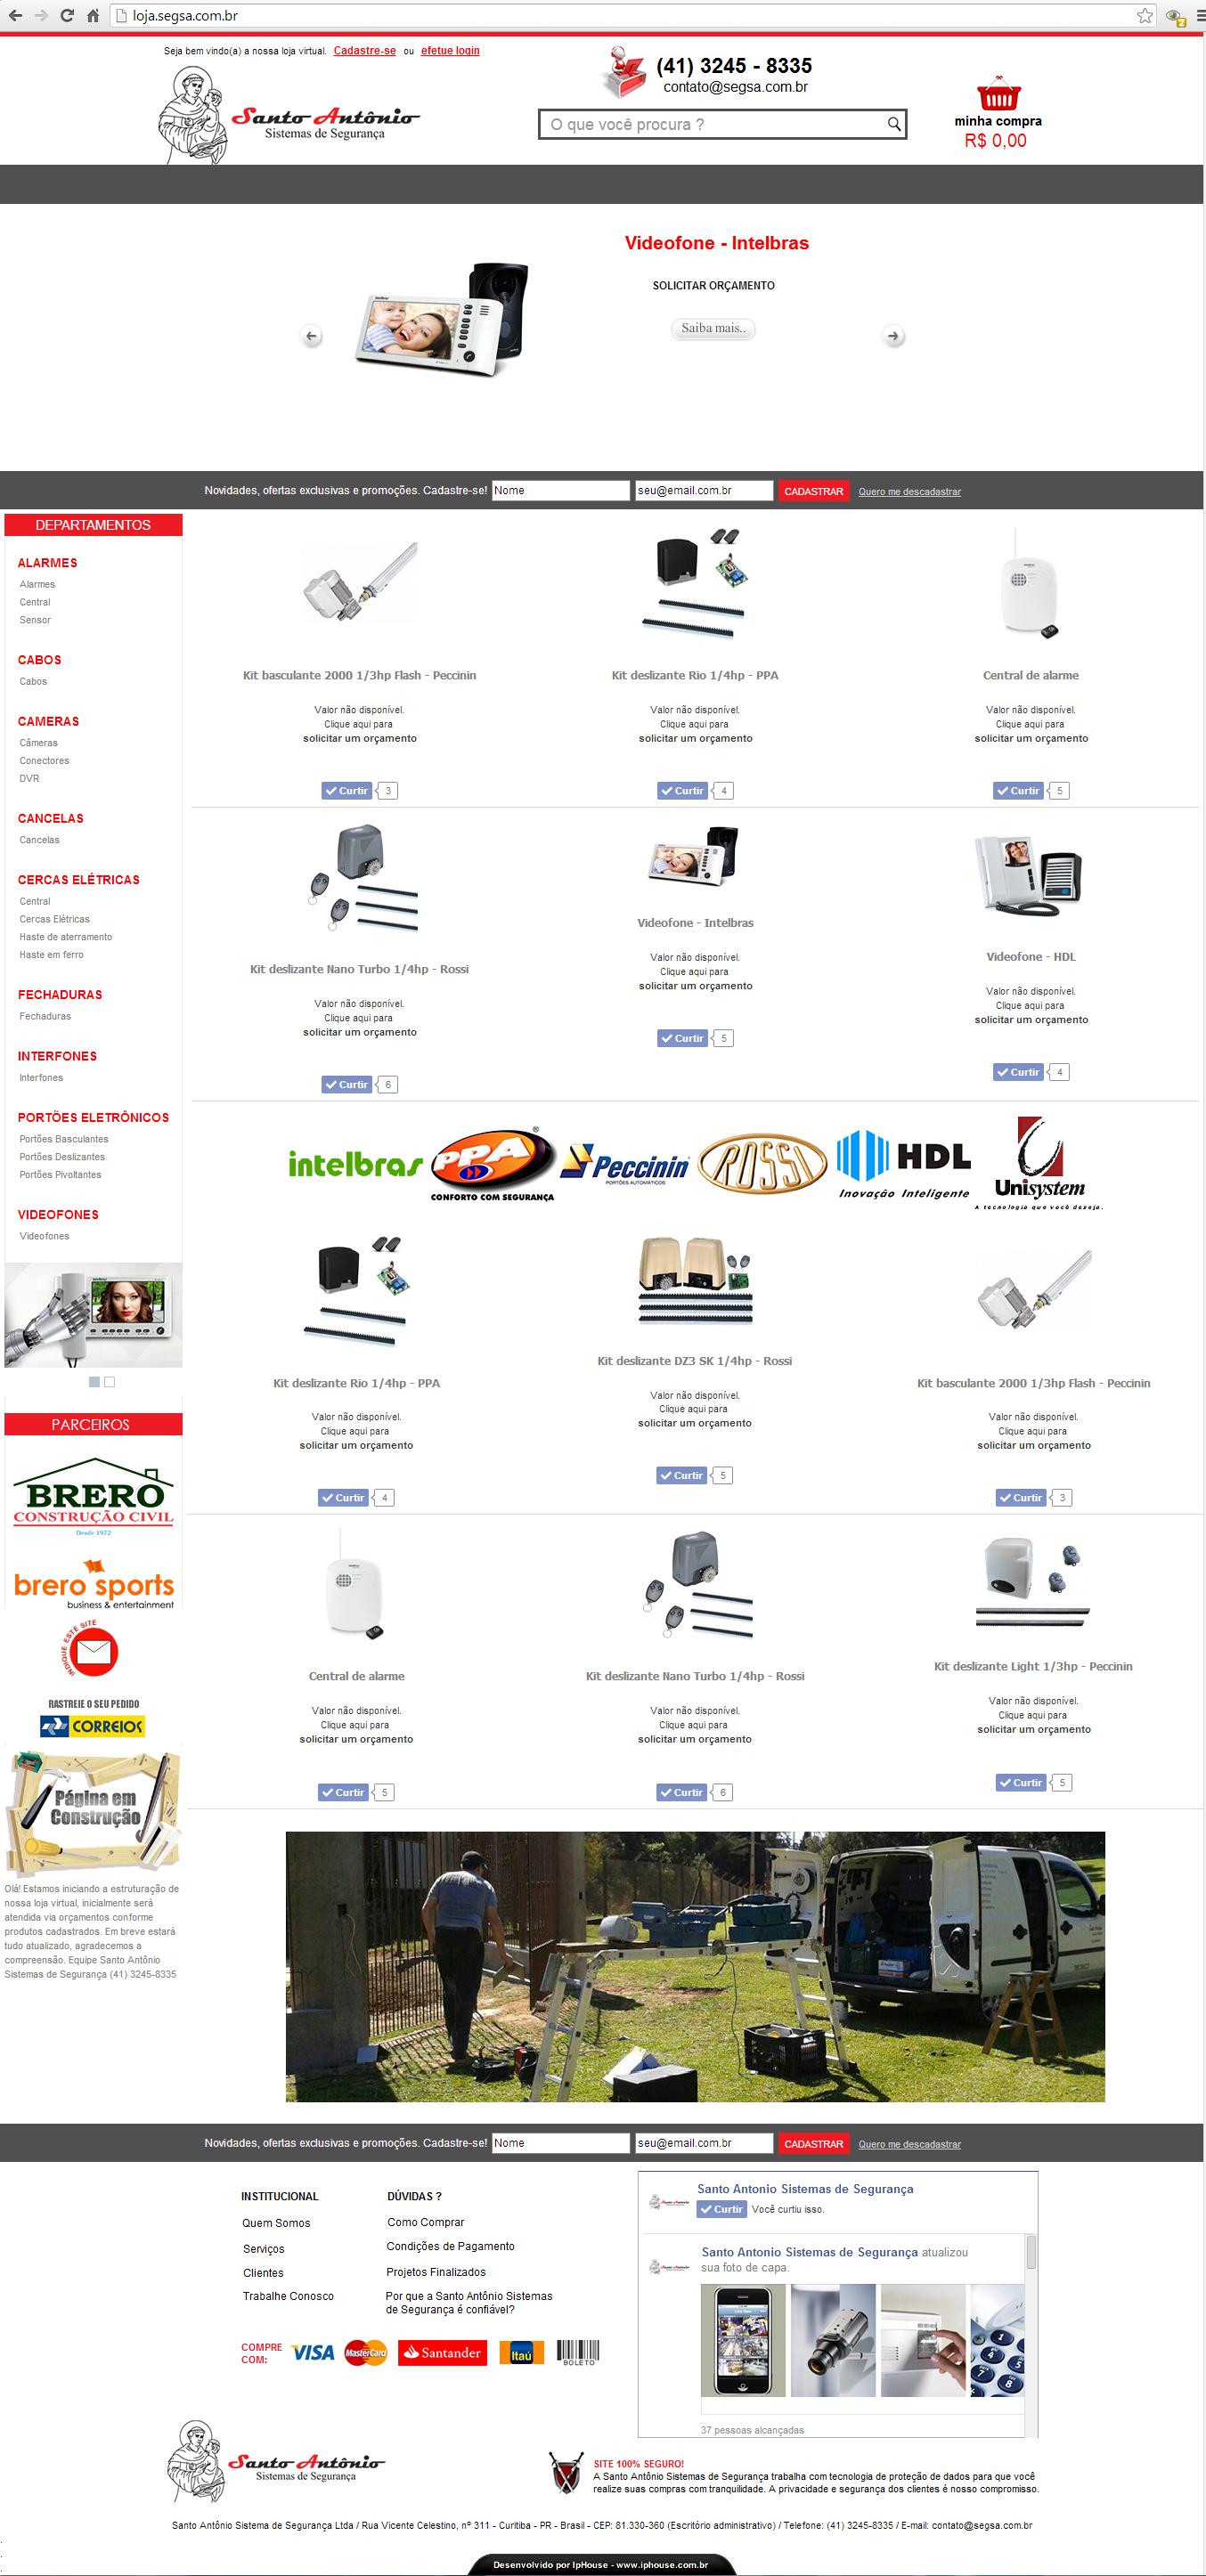 SegSAwebsite